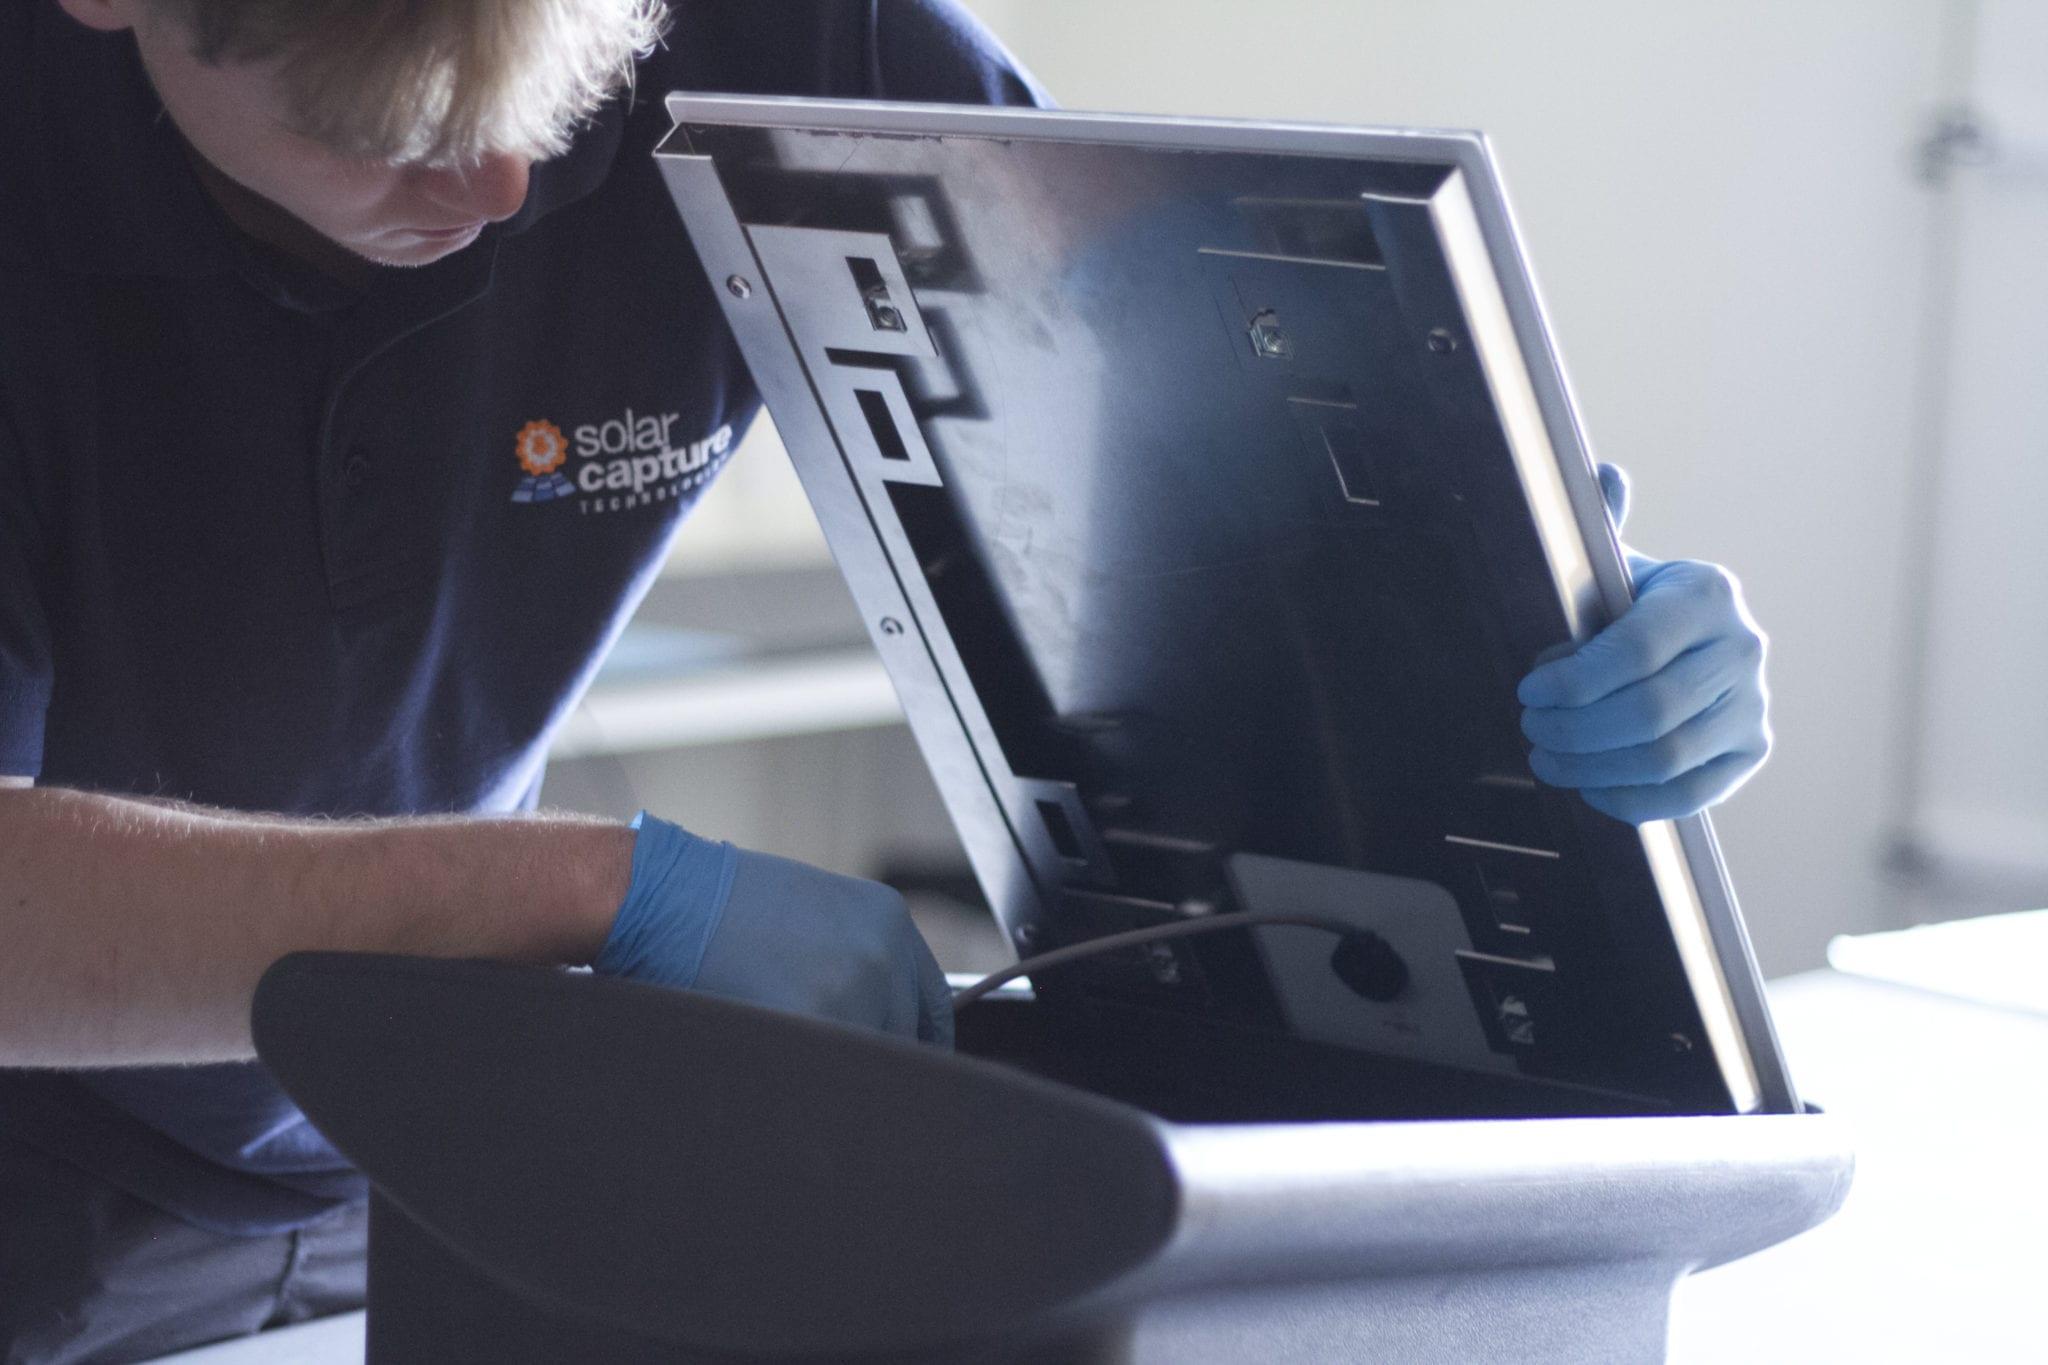 SolarCapture_SolarSolutions_CaseStudies_007